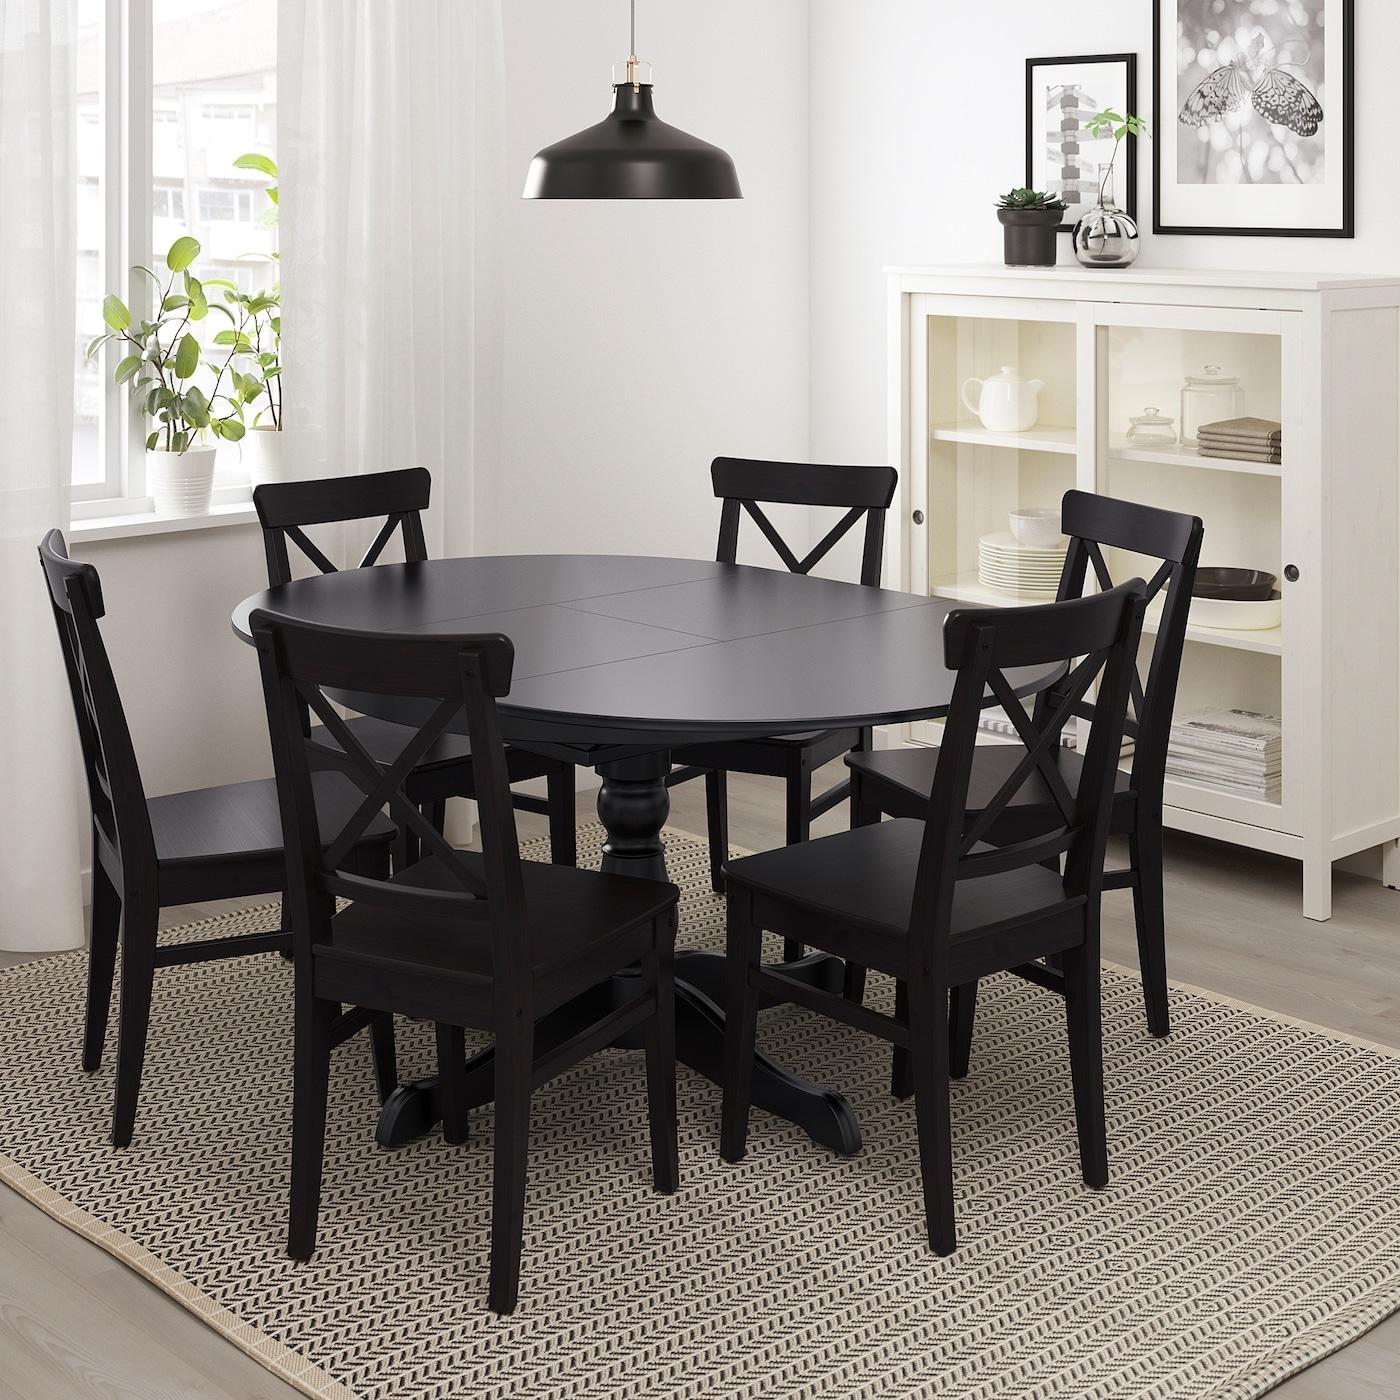 INGATORP Extendable table - black 7/7 cm